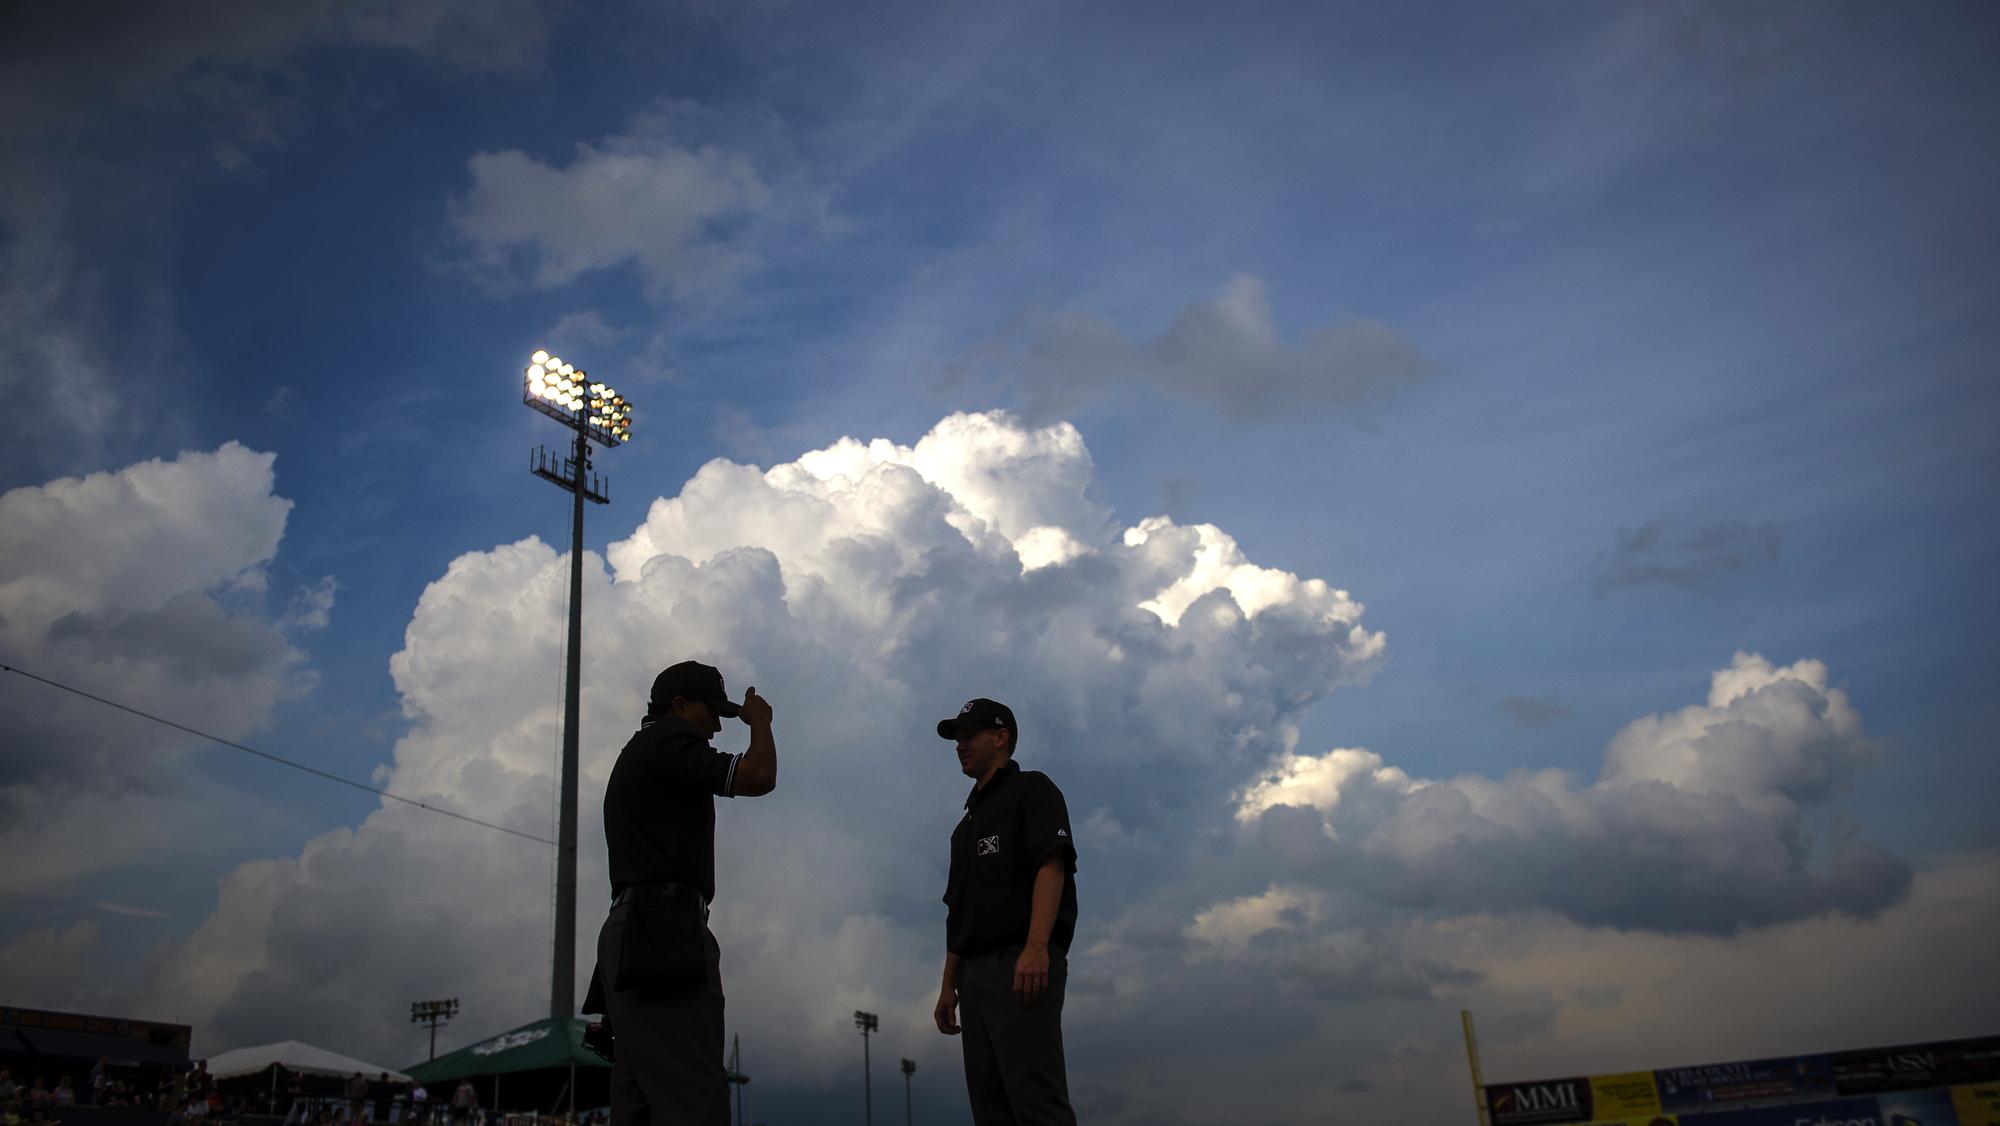 8e7d4ddef Minor-league umpires Erich Bacchus, Chase Eade face long road, odds to the  majors - Washington Times